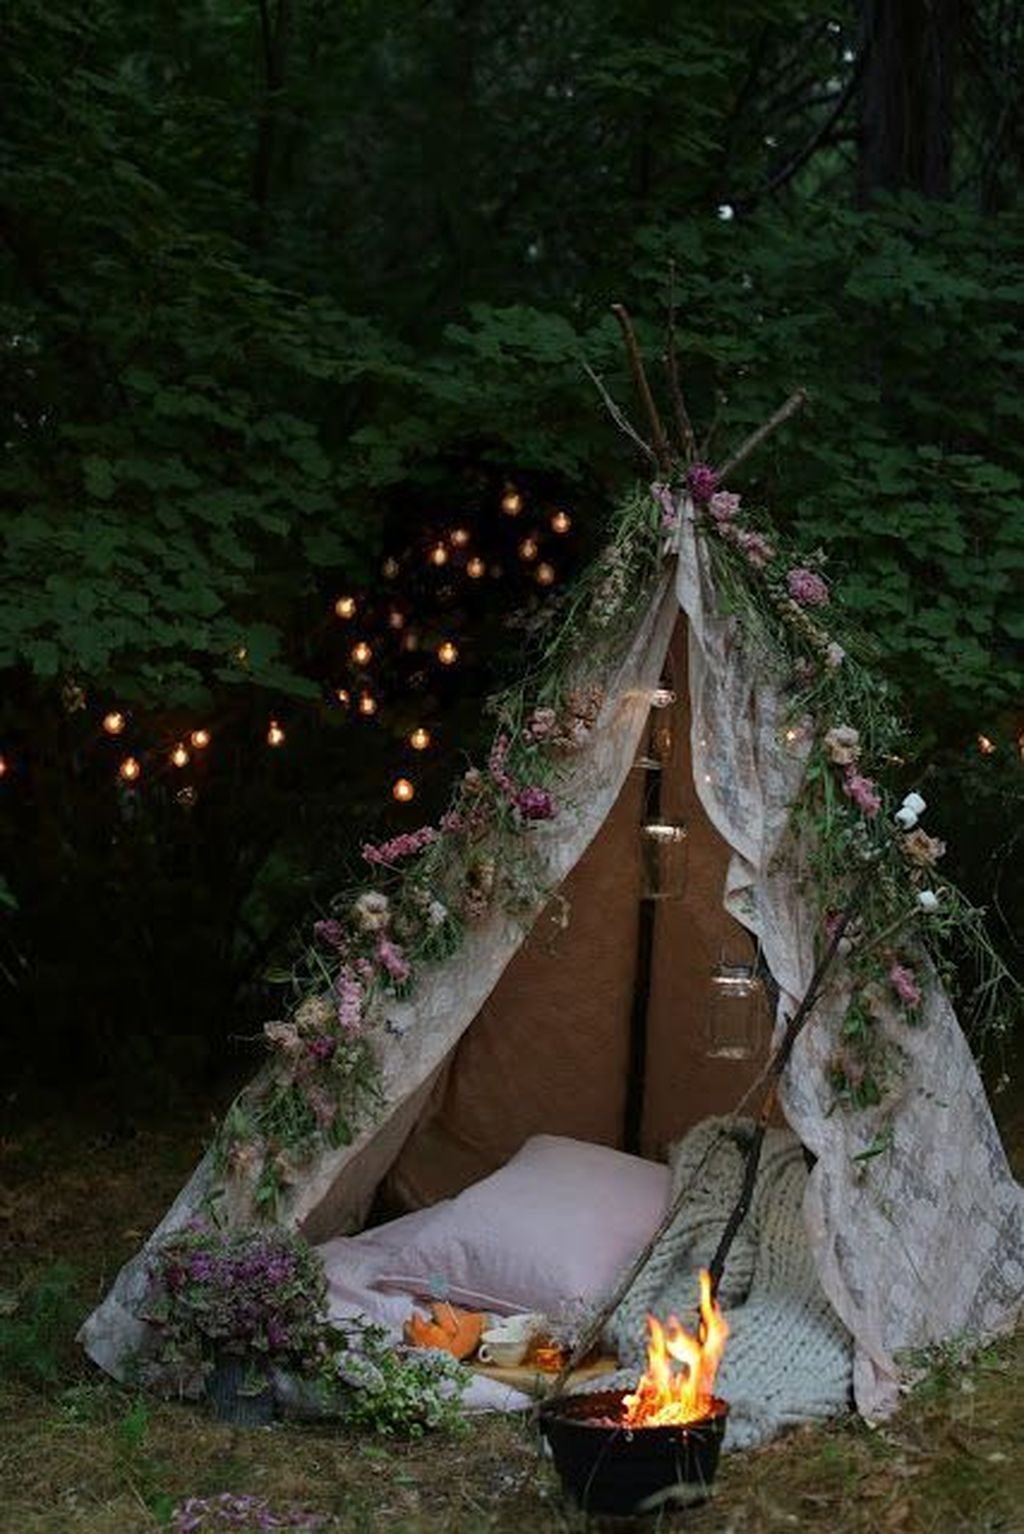 The Best Romantic Backyard Decorating Ideas 14